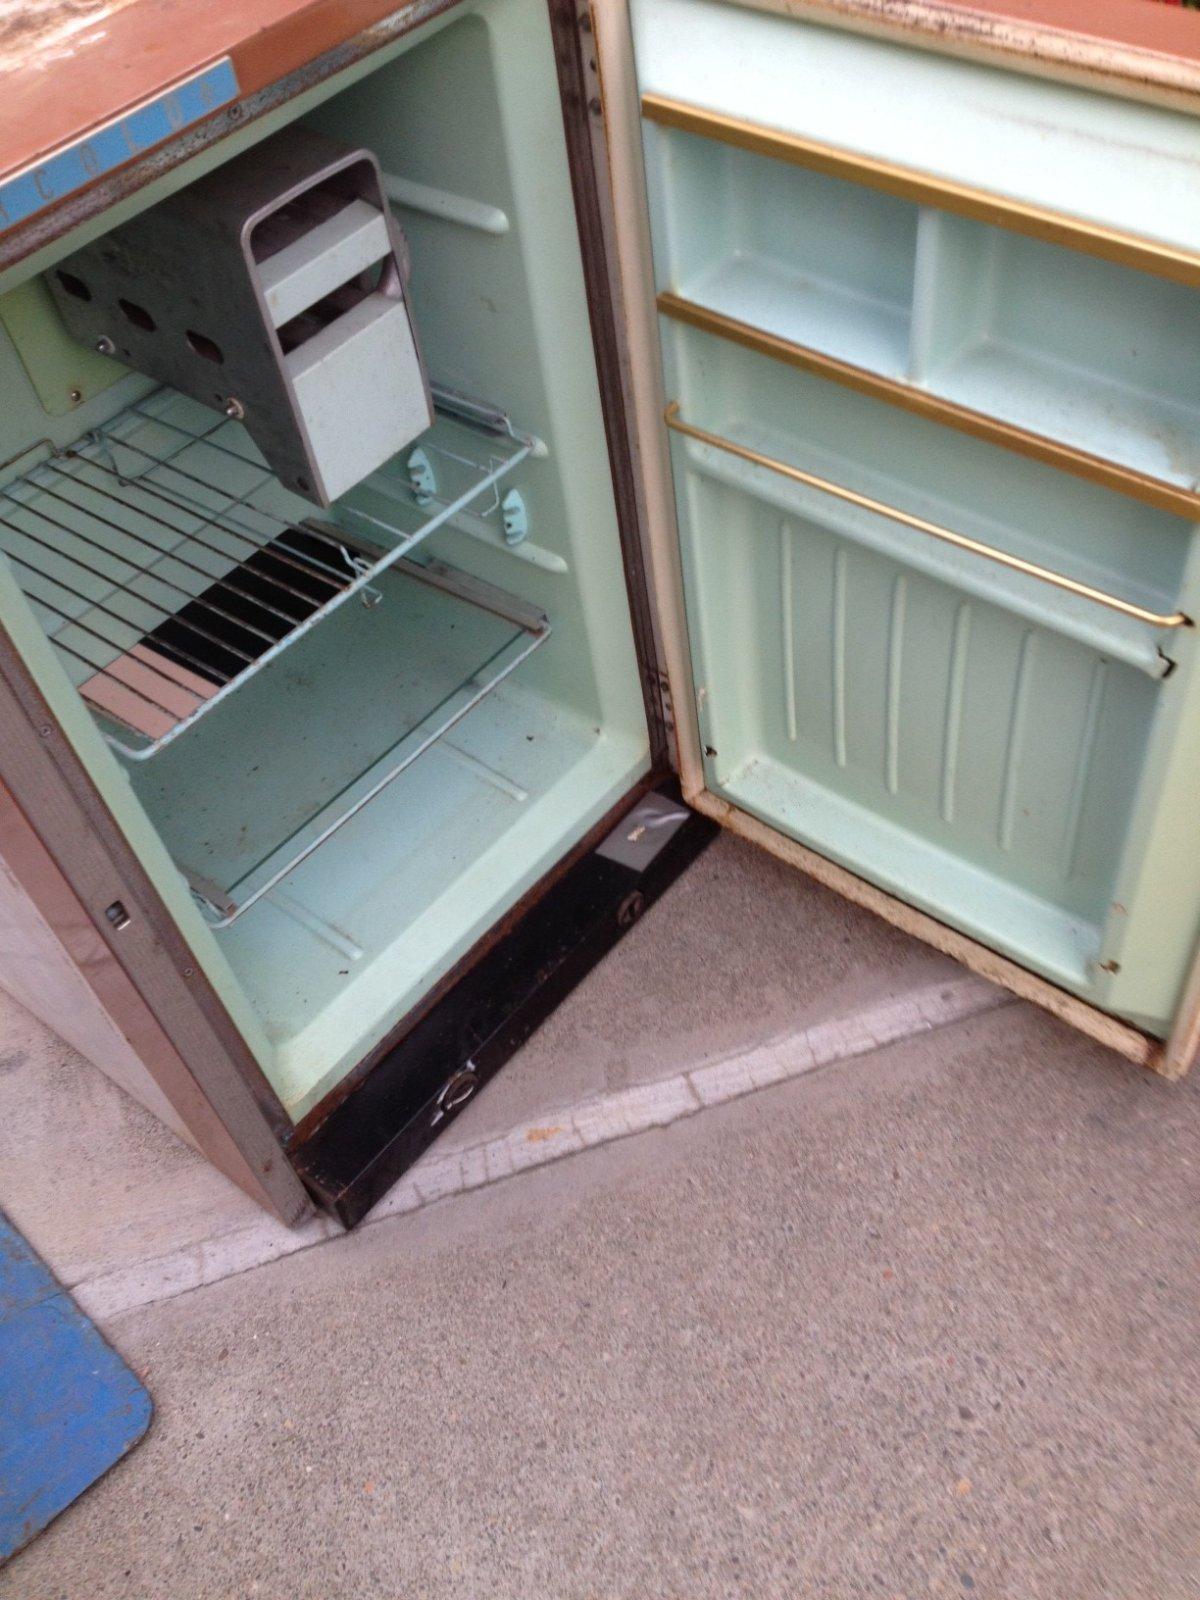 Click image for larger version  Name:fridge2.jpg Views:56 Size:278.8 KB ID:163307